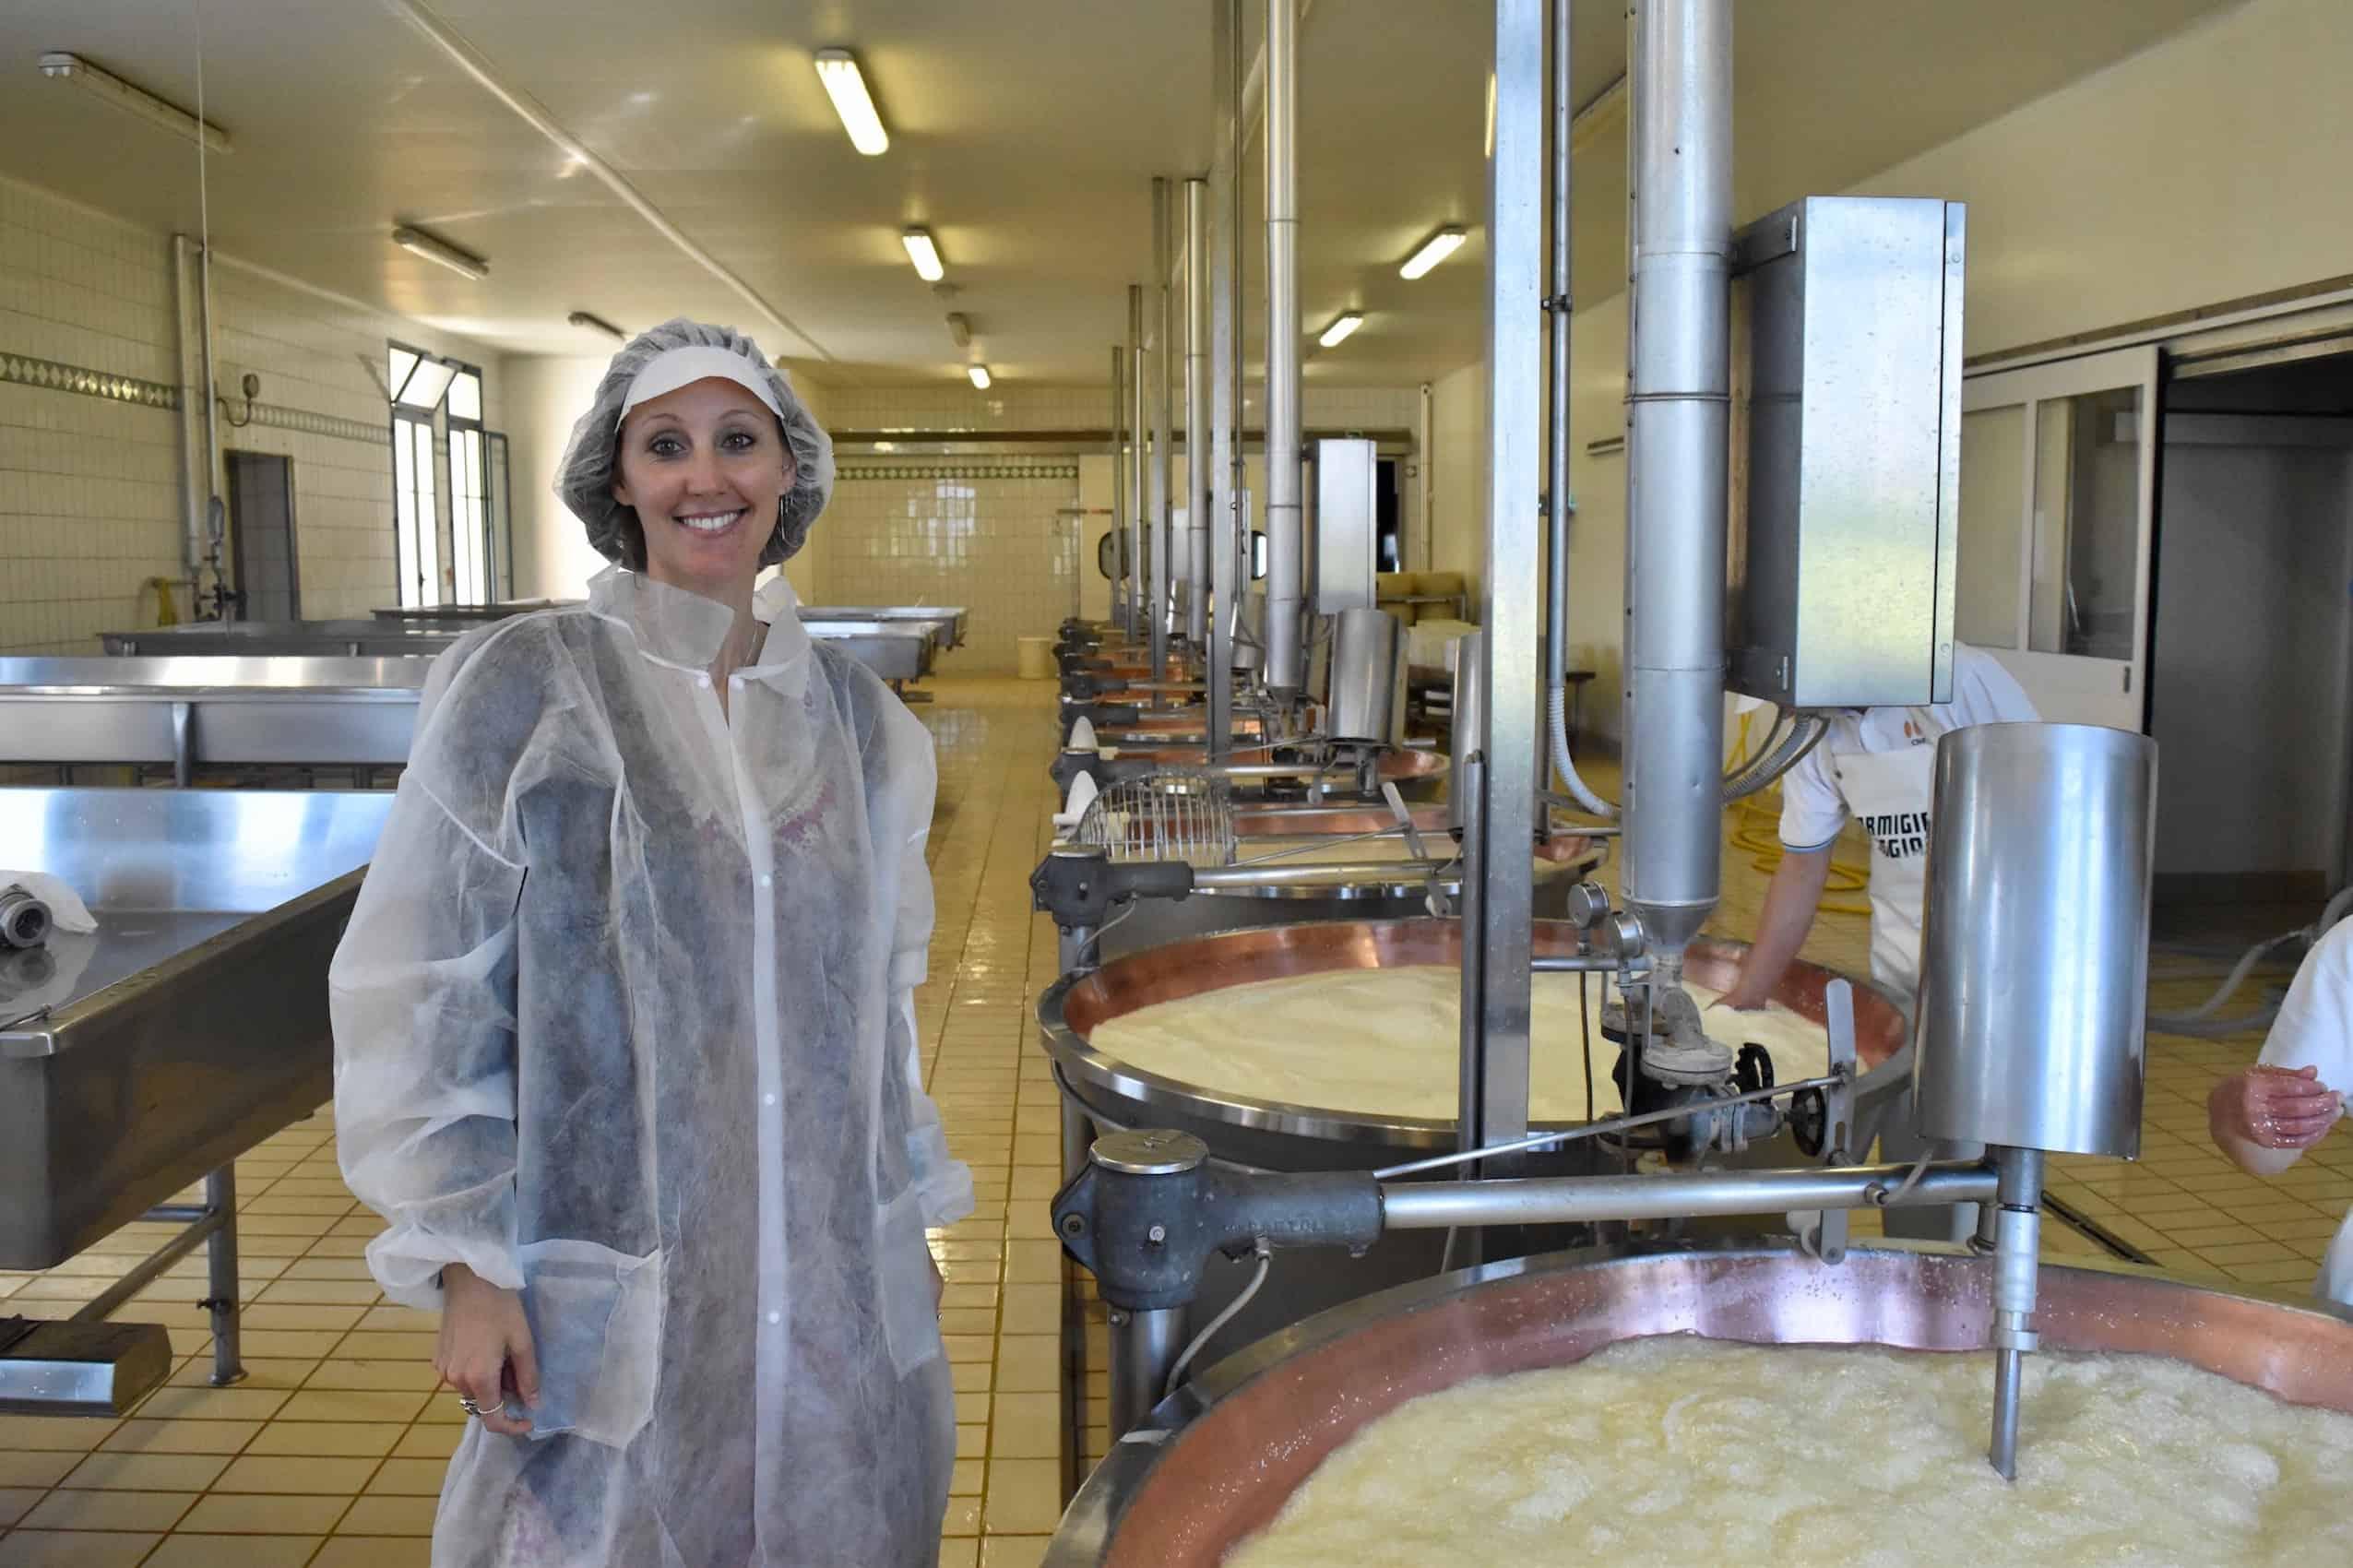 Huge vats of milk, part of the process of producing Parmigiano Reggiano